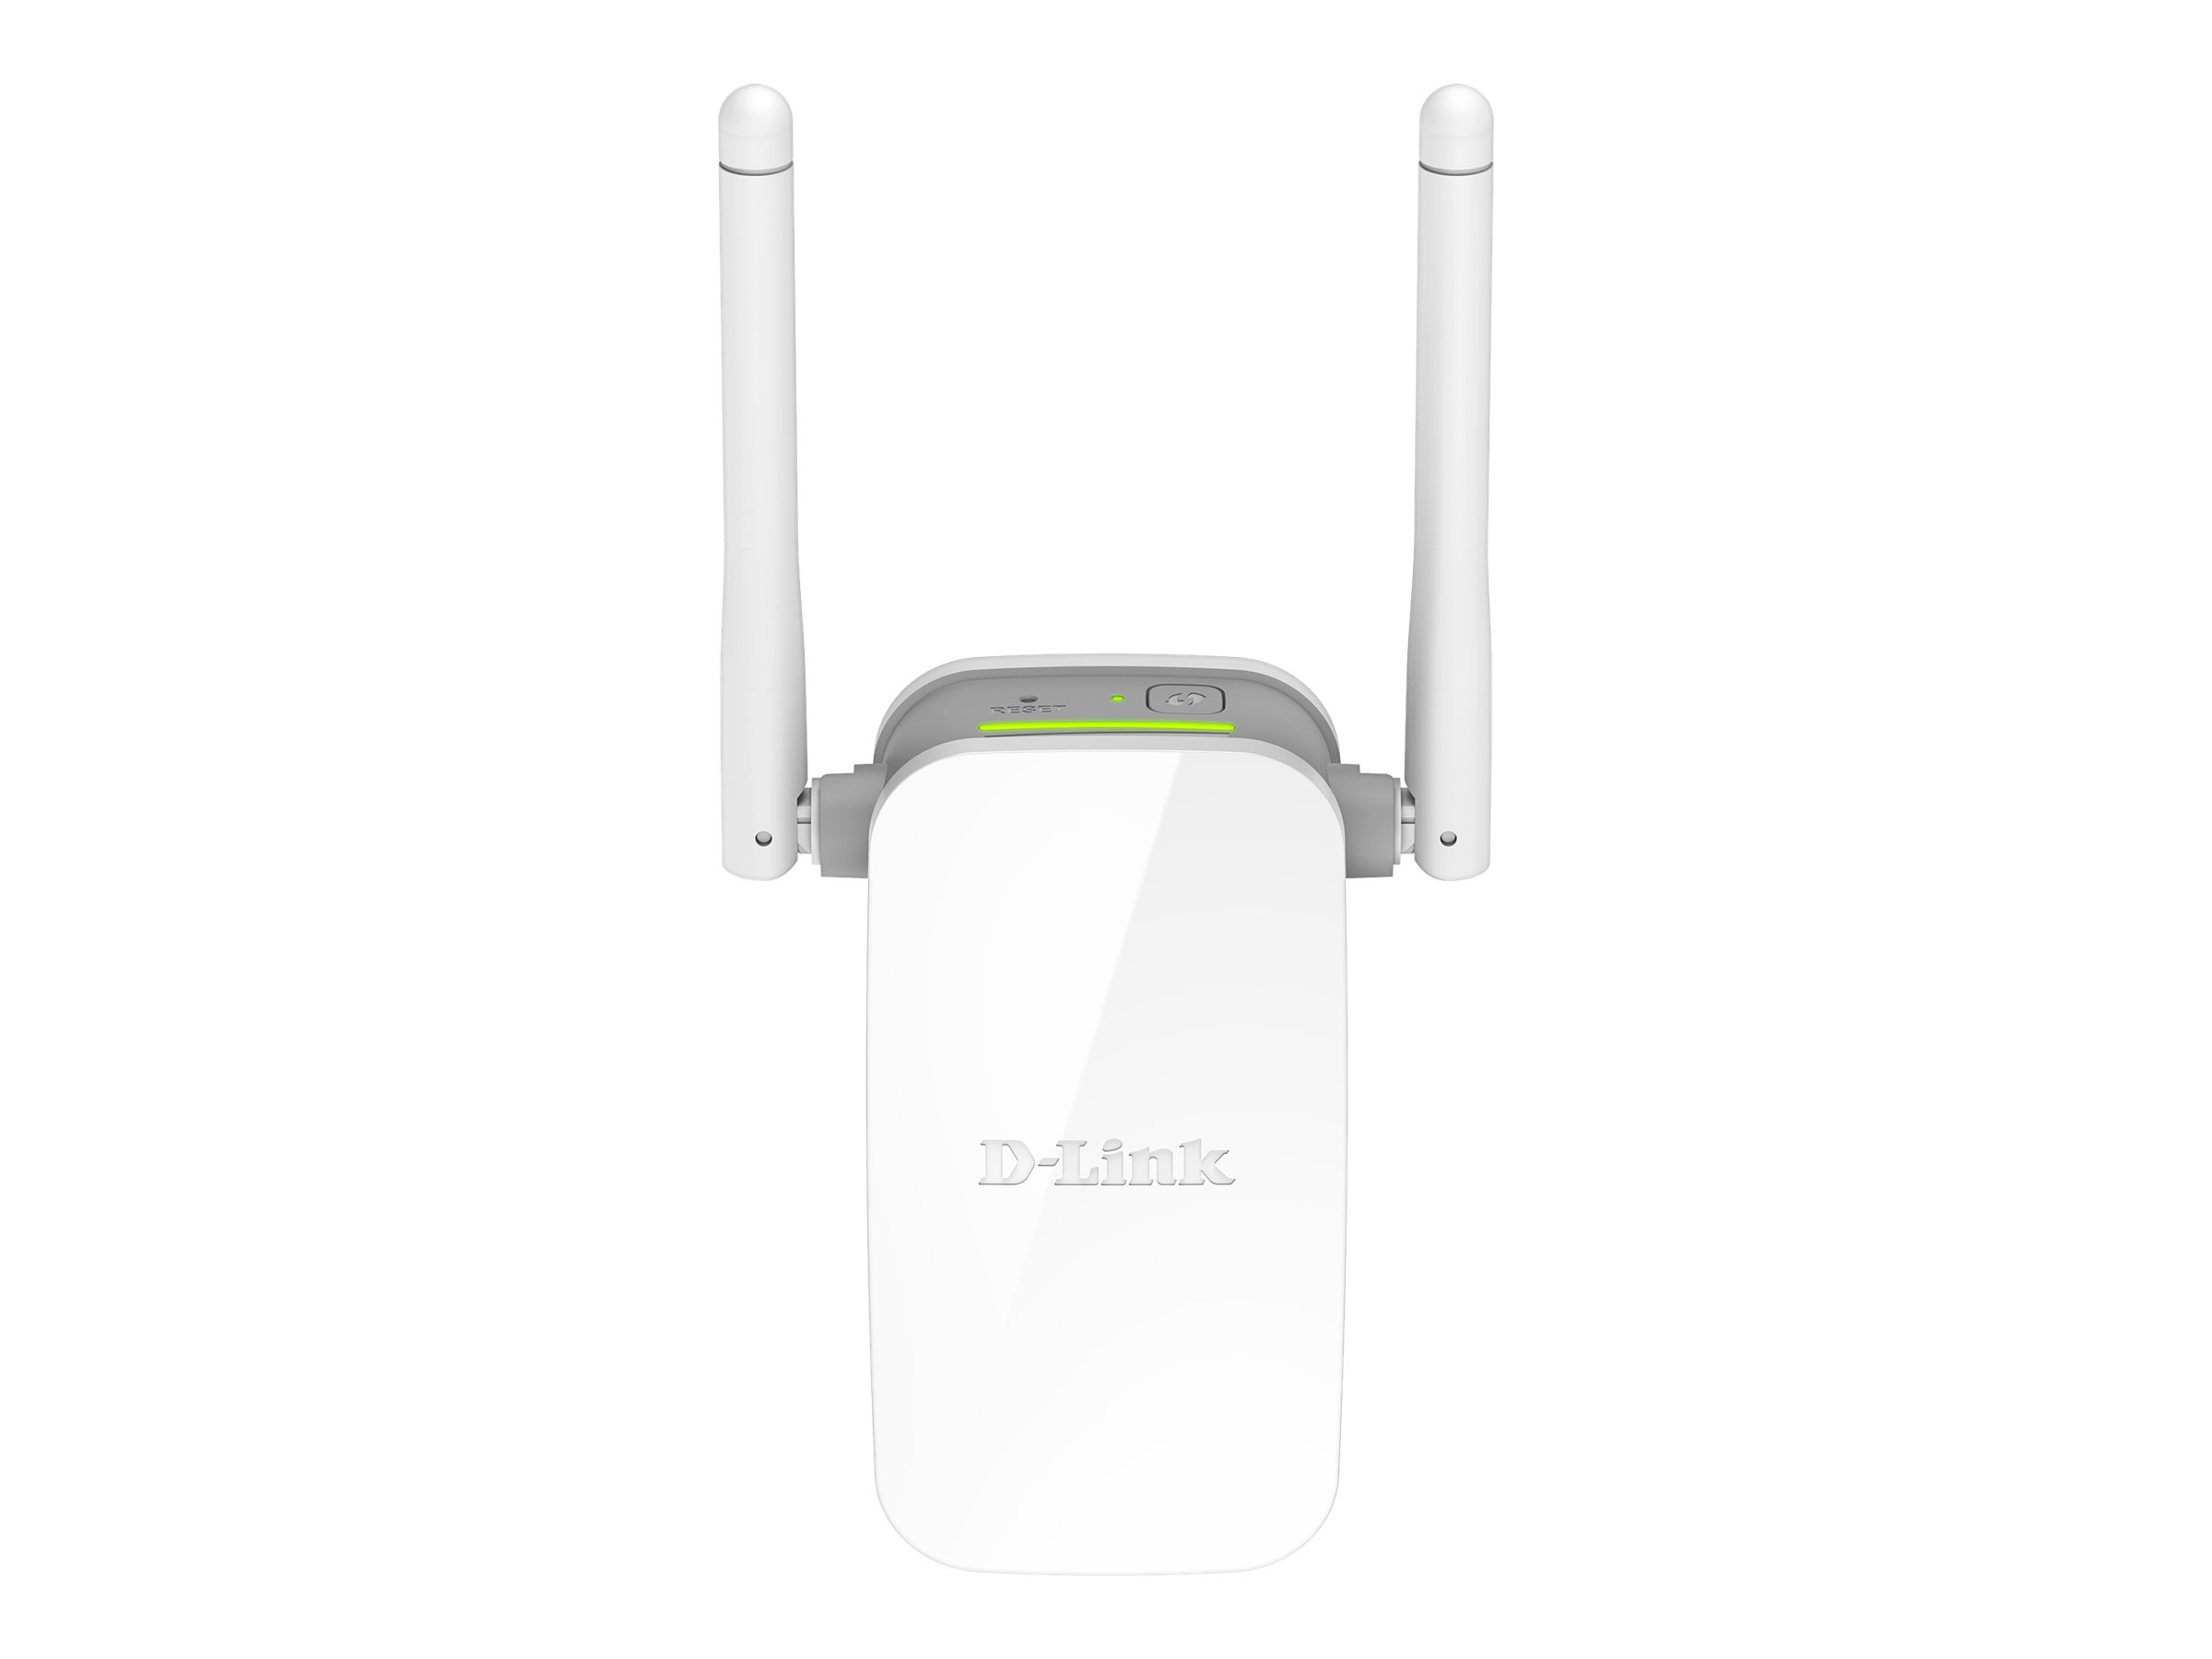 D-Link DAP-1325 - Wi-Fi-Range-Extender - Wi-Fi, Wi-Fi - AC 100/230 V